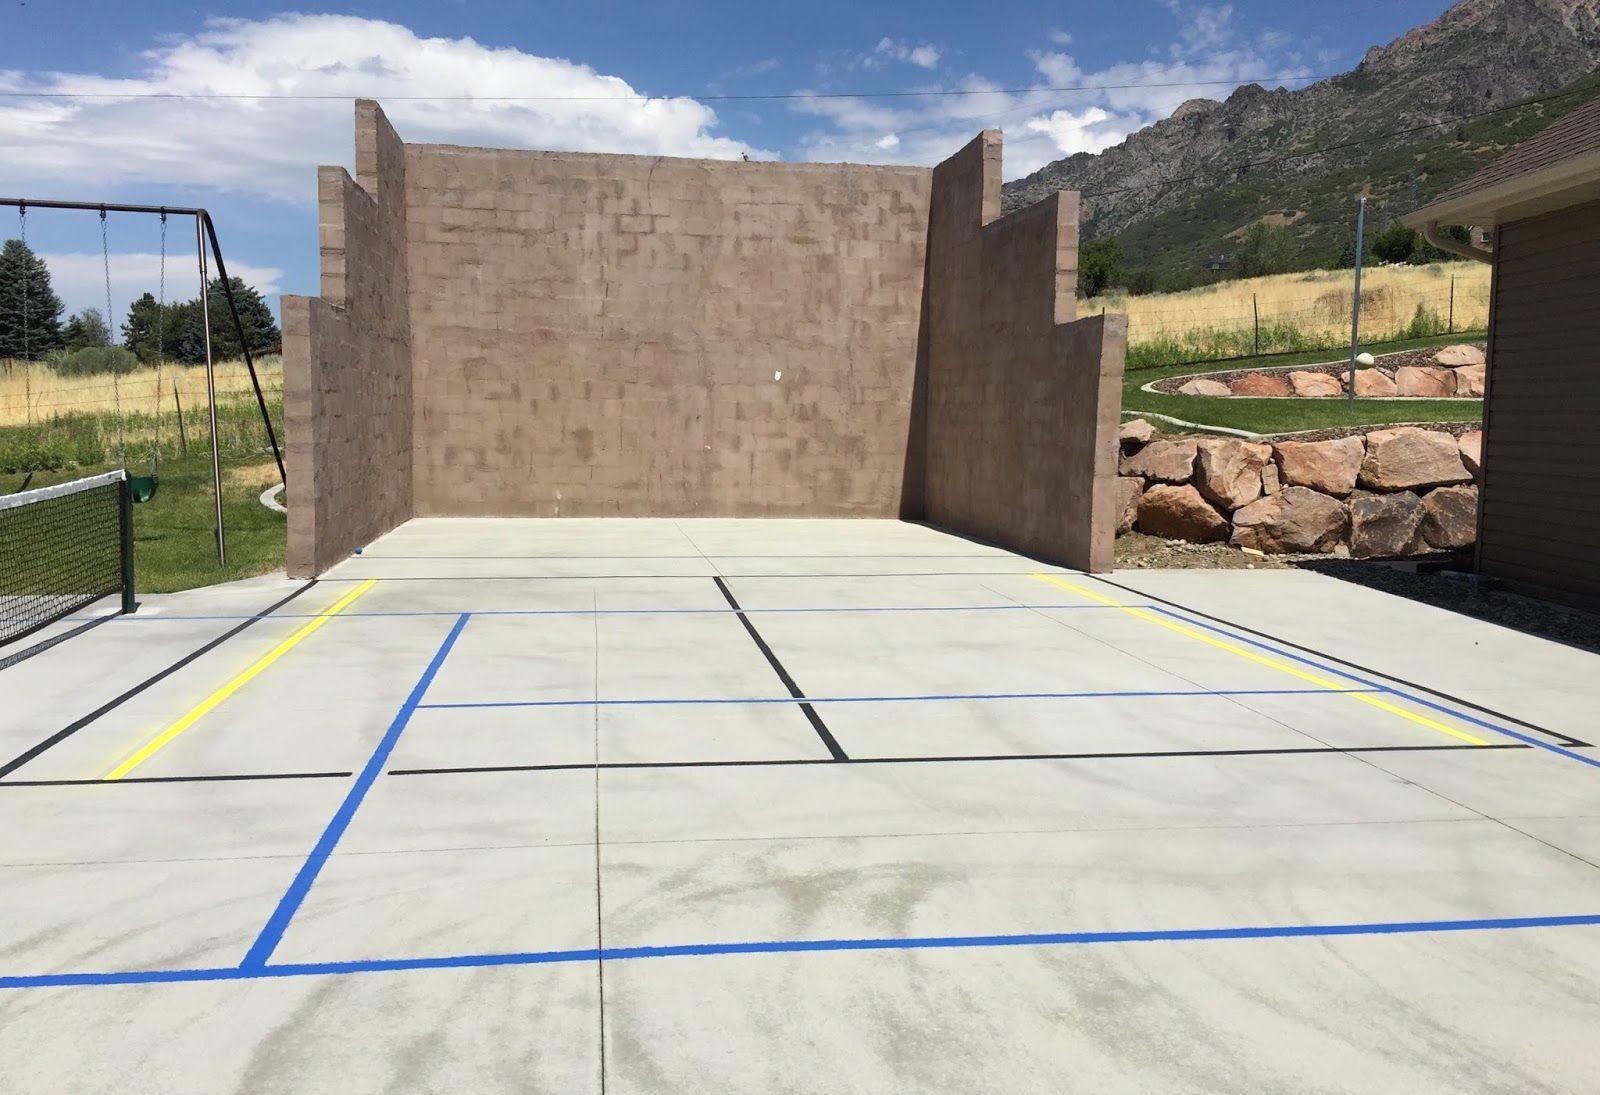 Diy Projects Building An Outdoor Racquetball Court Outdoor Racquetball Backyard